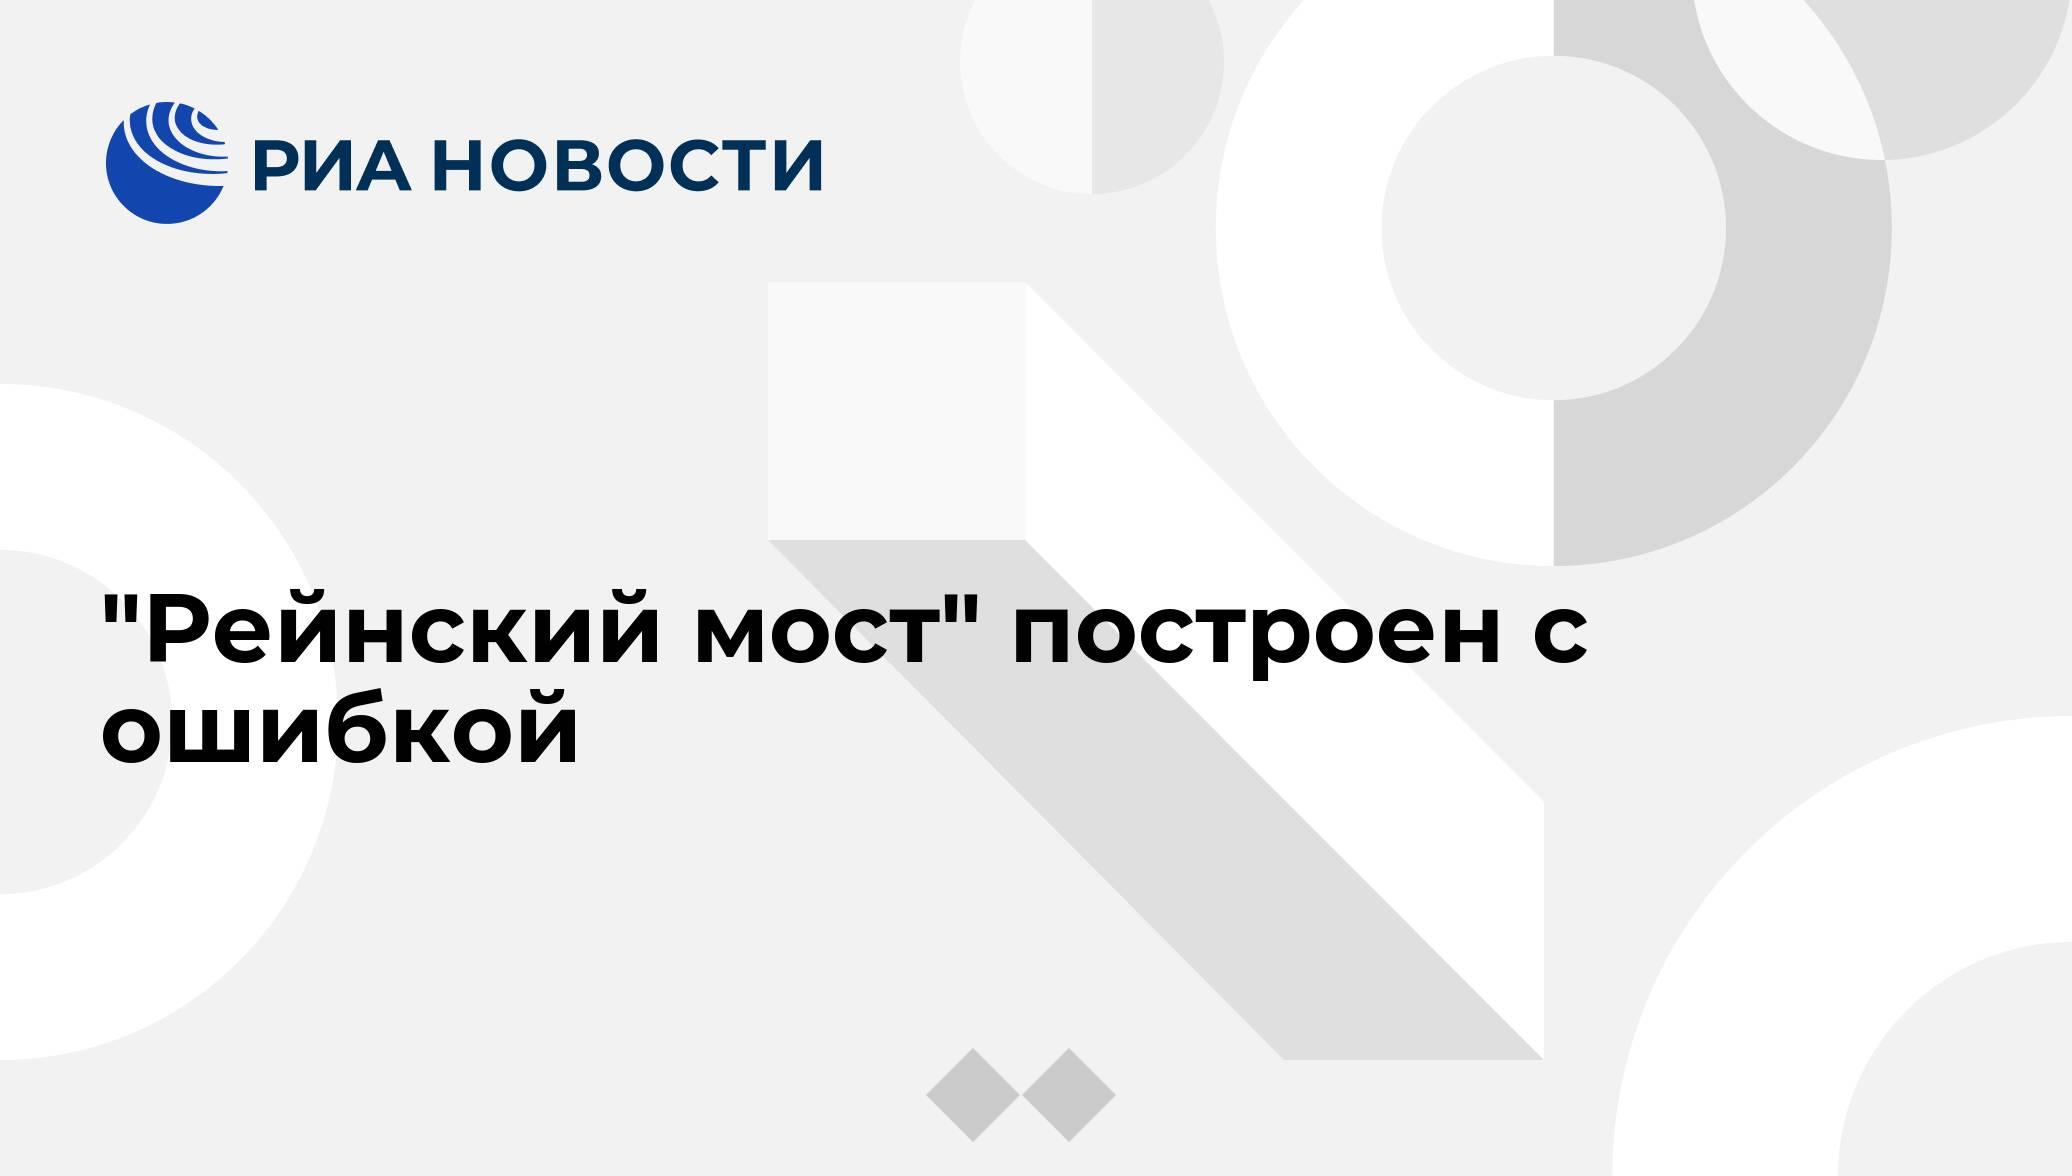 """Рейнский мост"" построен с ошибкой - РИА Новости, 14.01.2004"